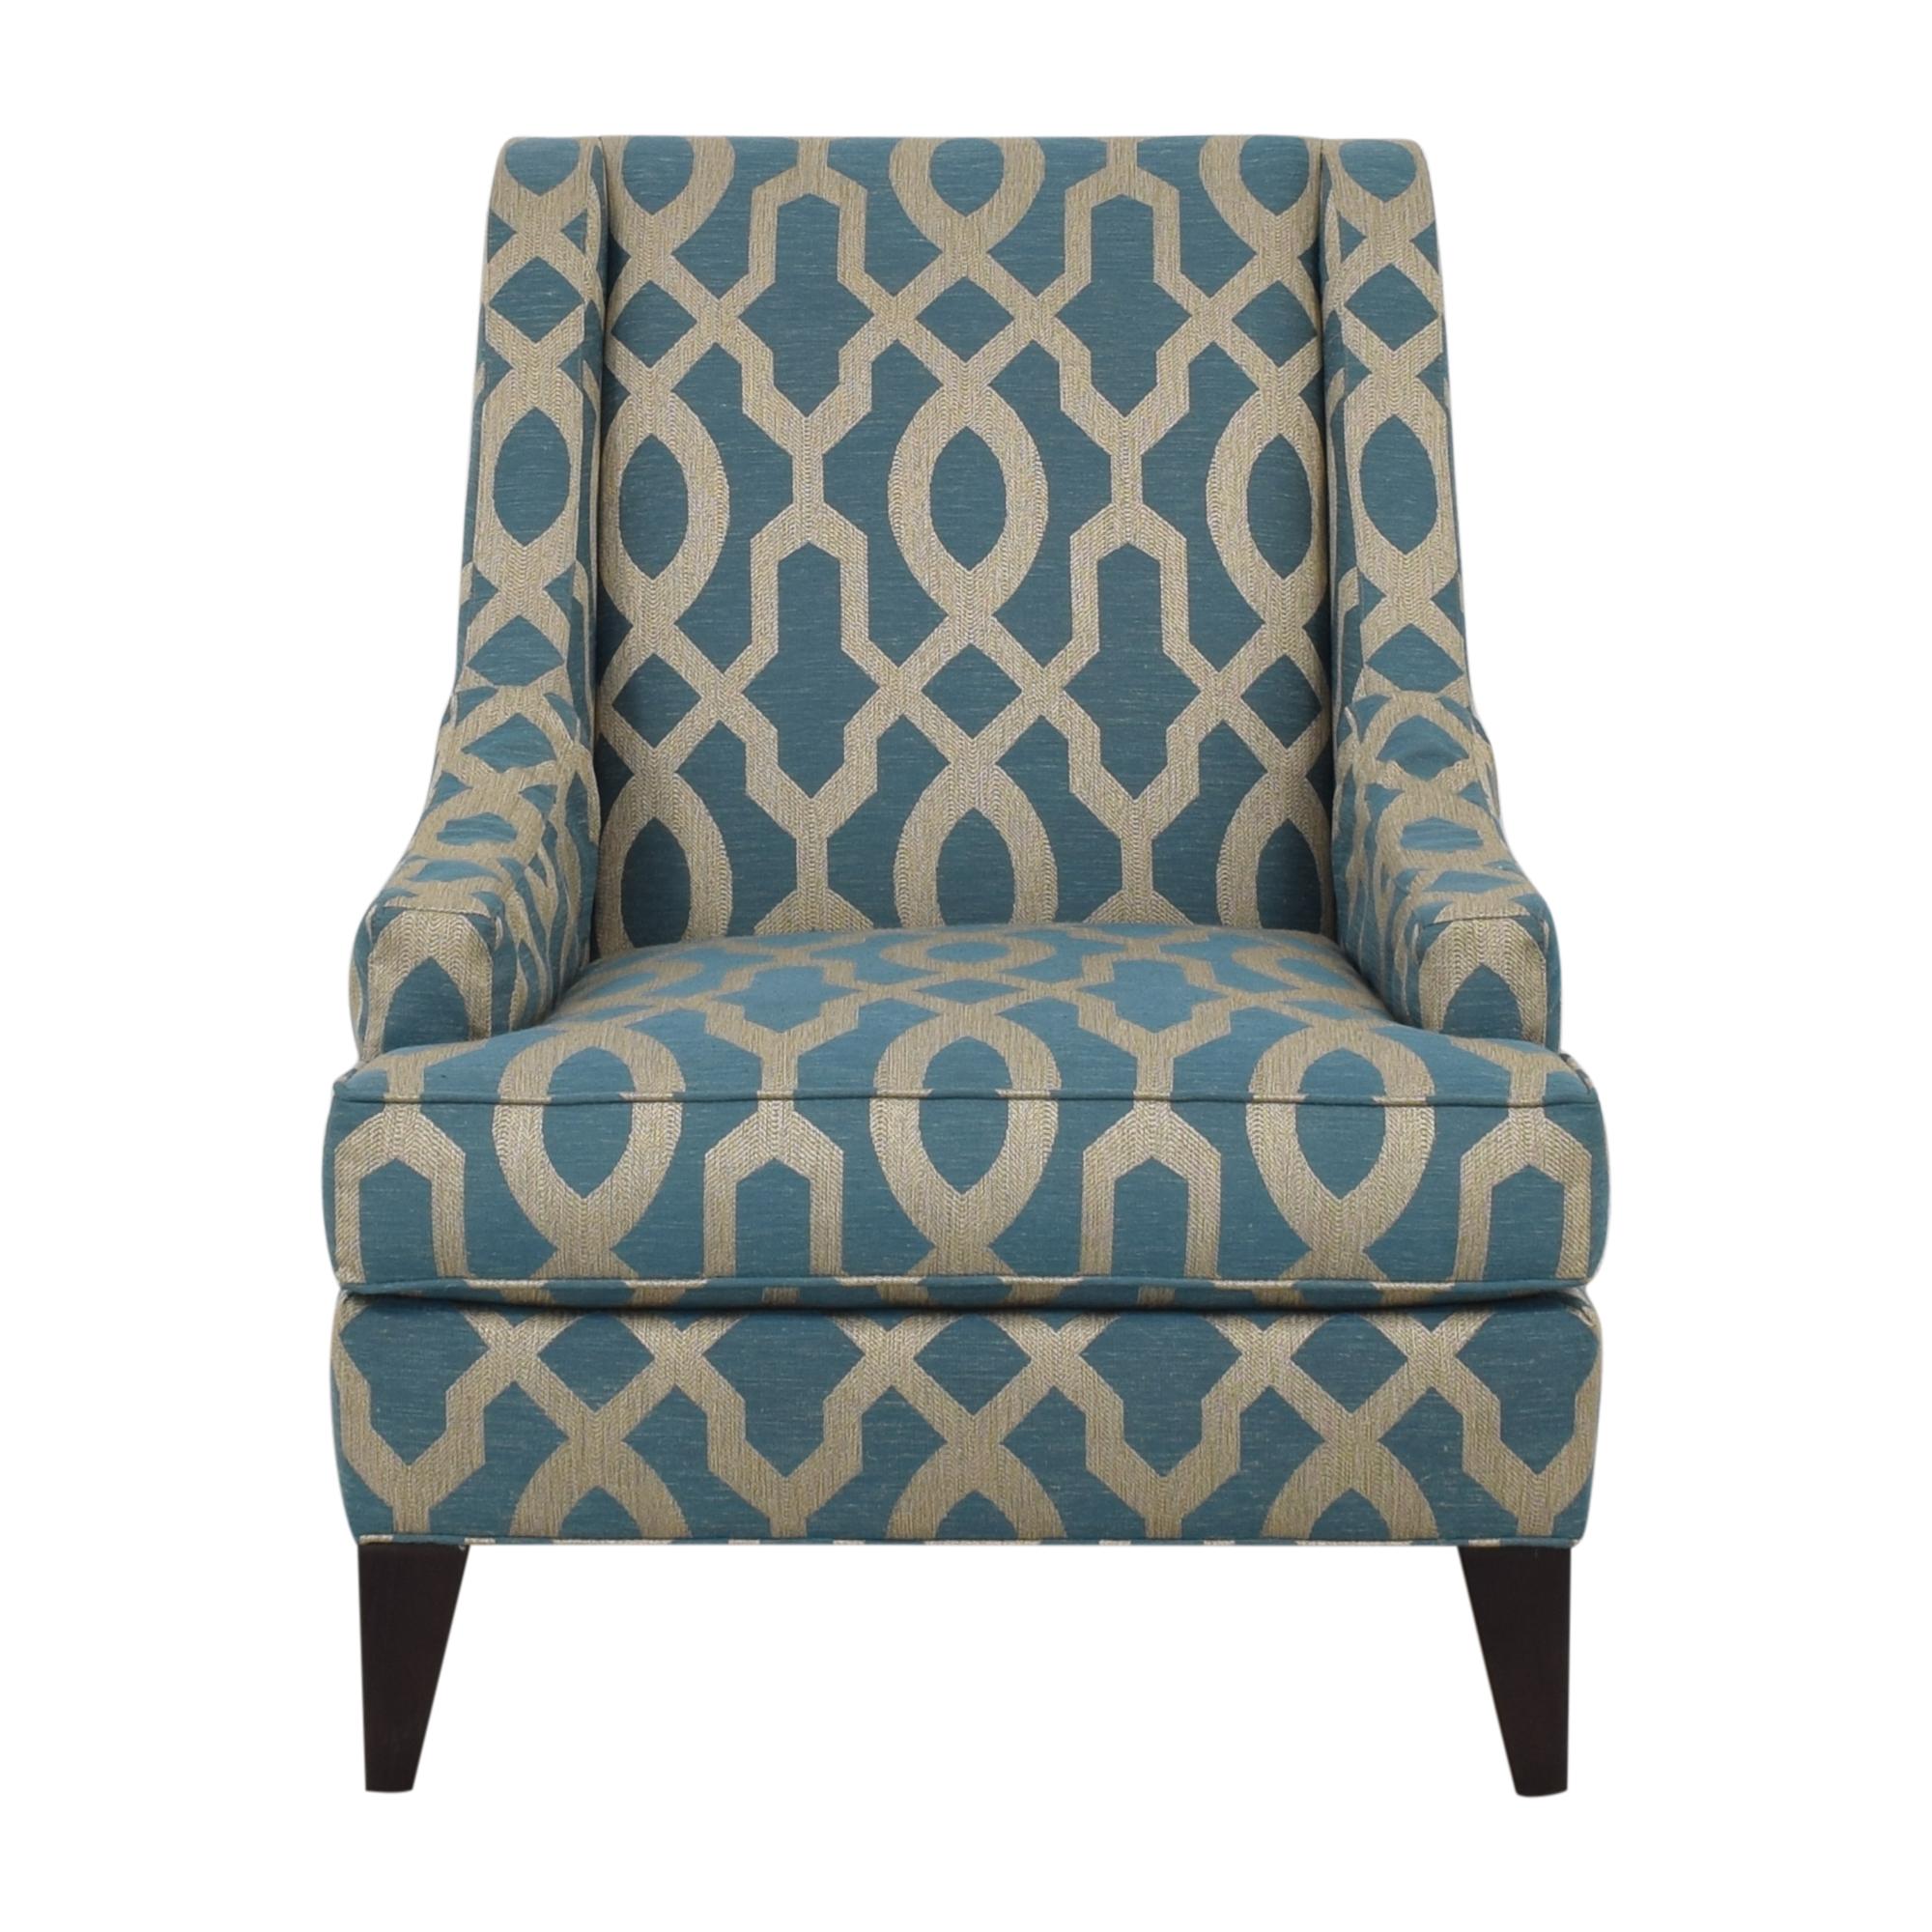 Ethan Allen Ethan Allen Emerson Chair and Ottoman price